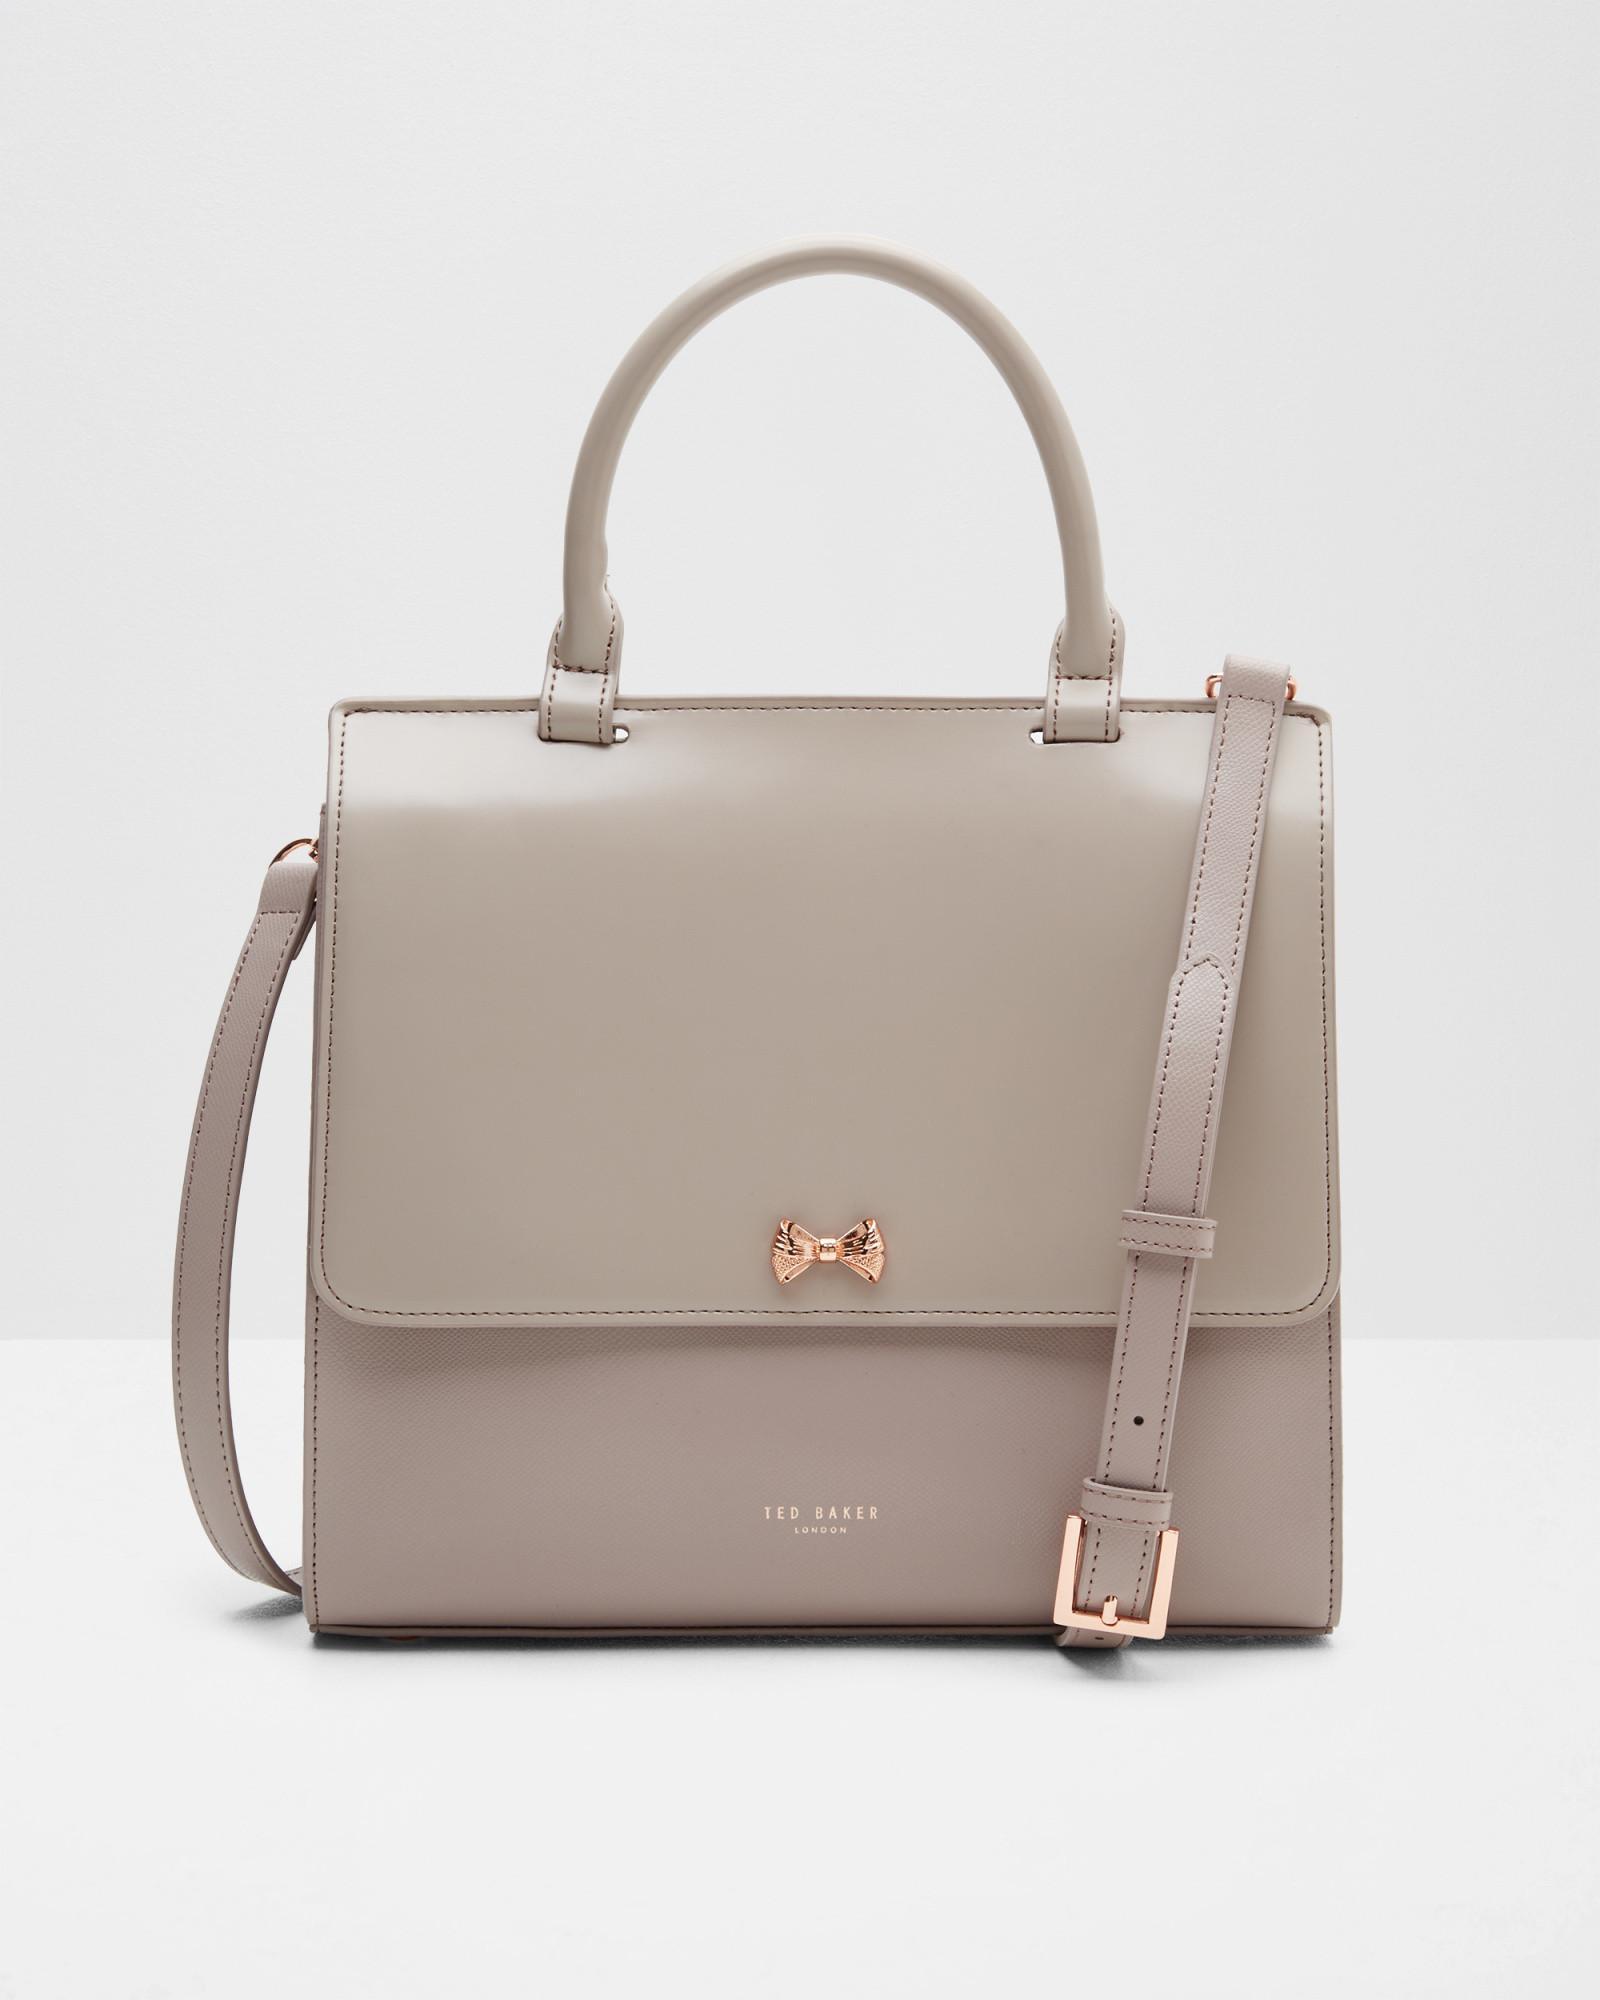 4ba23836ba Ted Baker Otillia Top Handle Leather Bag - Lyst